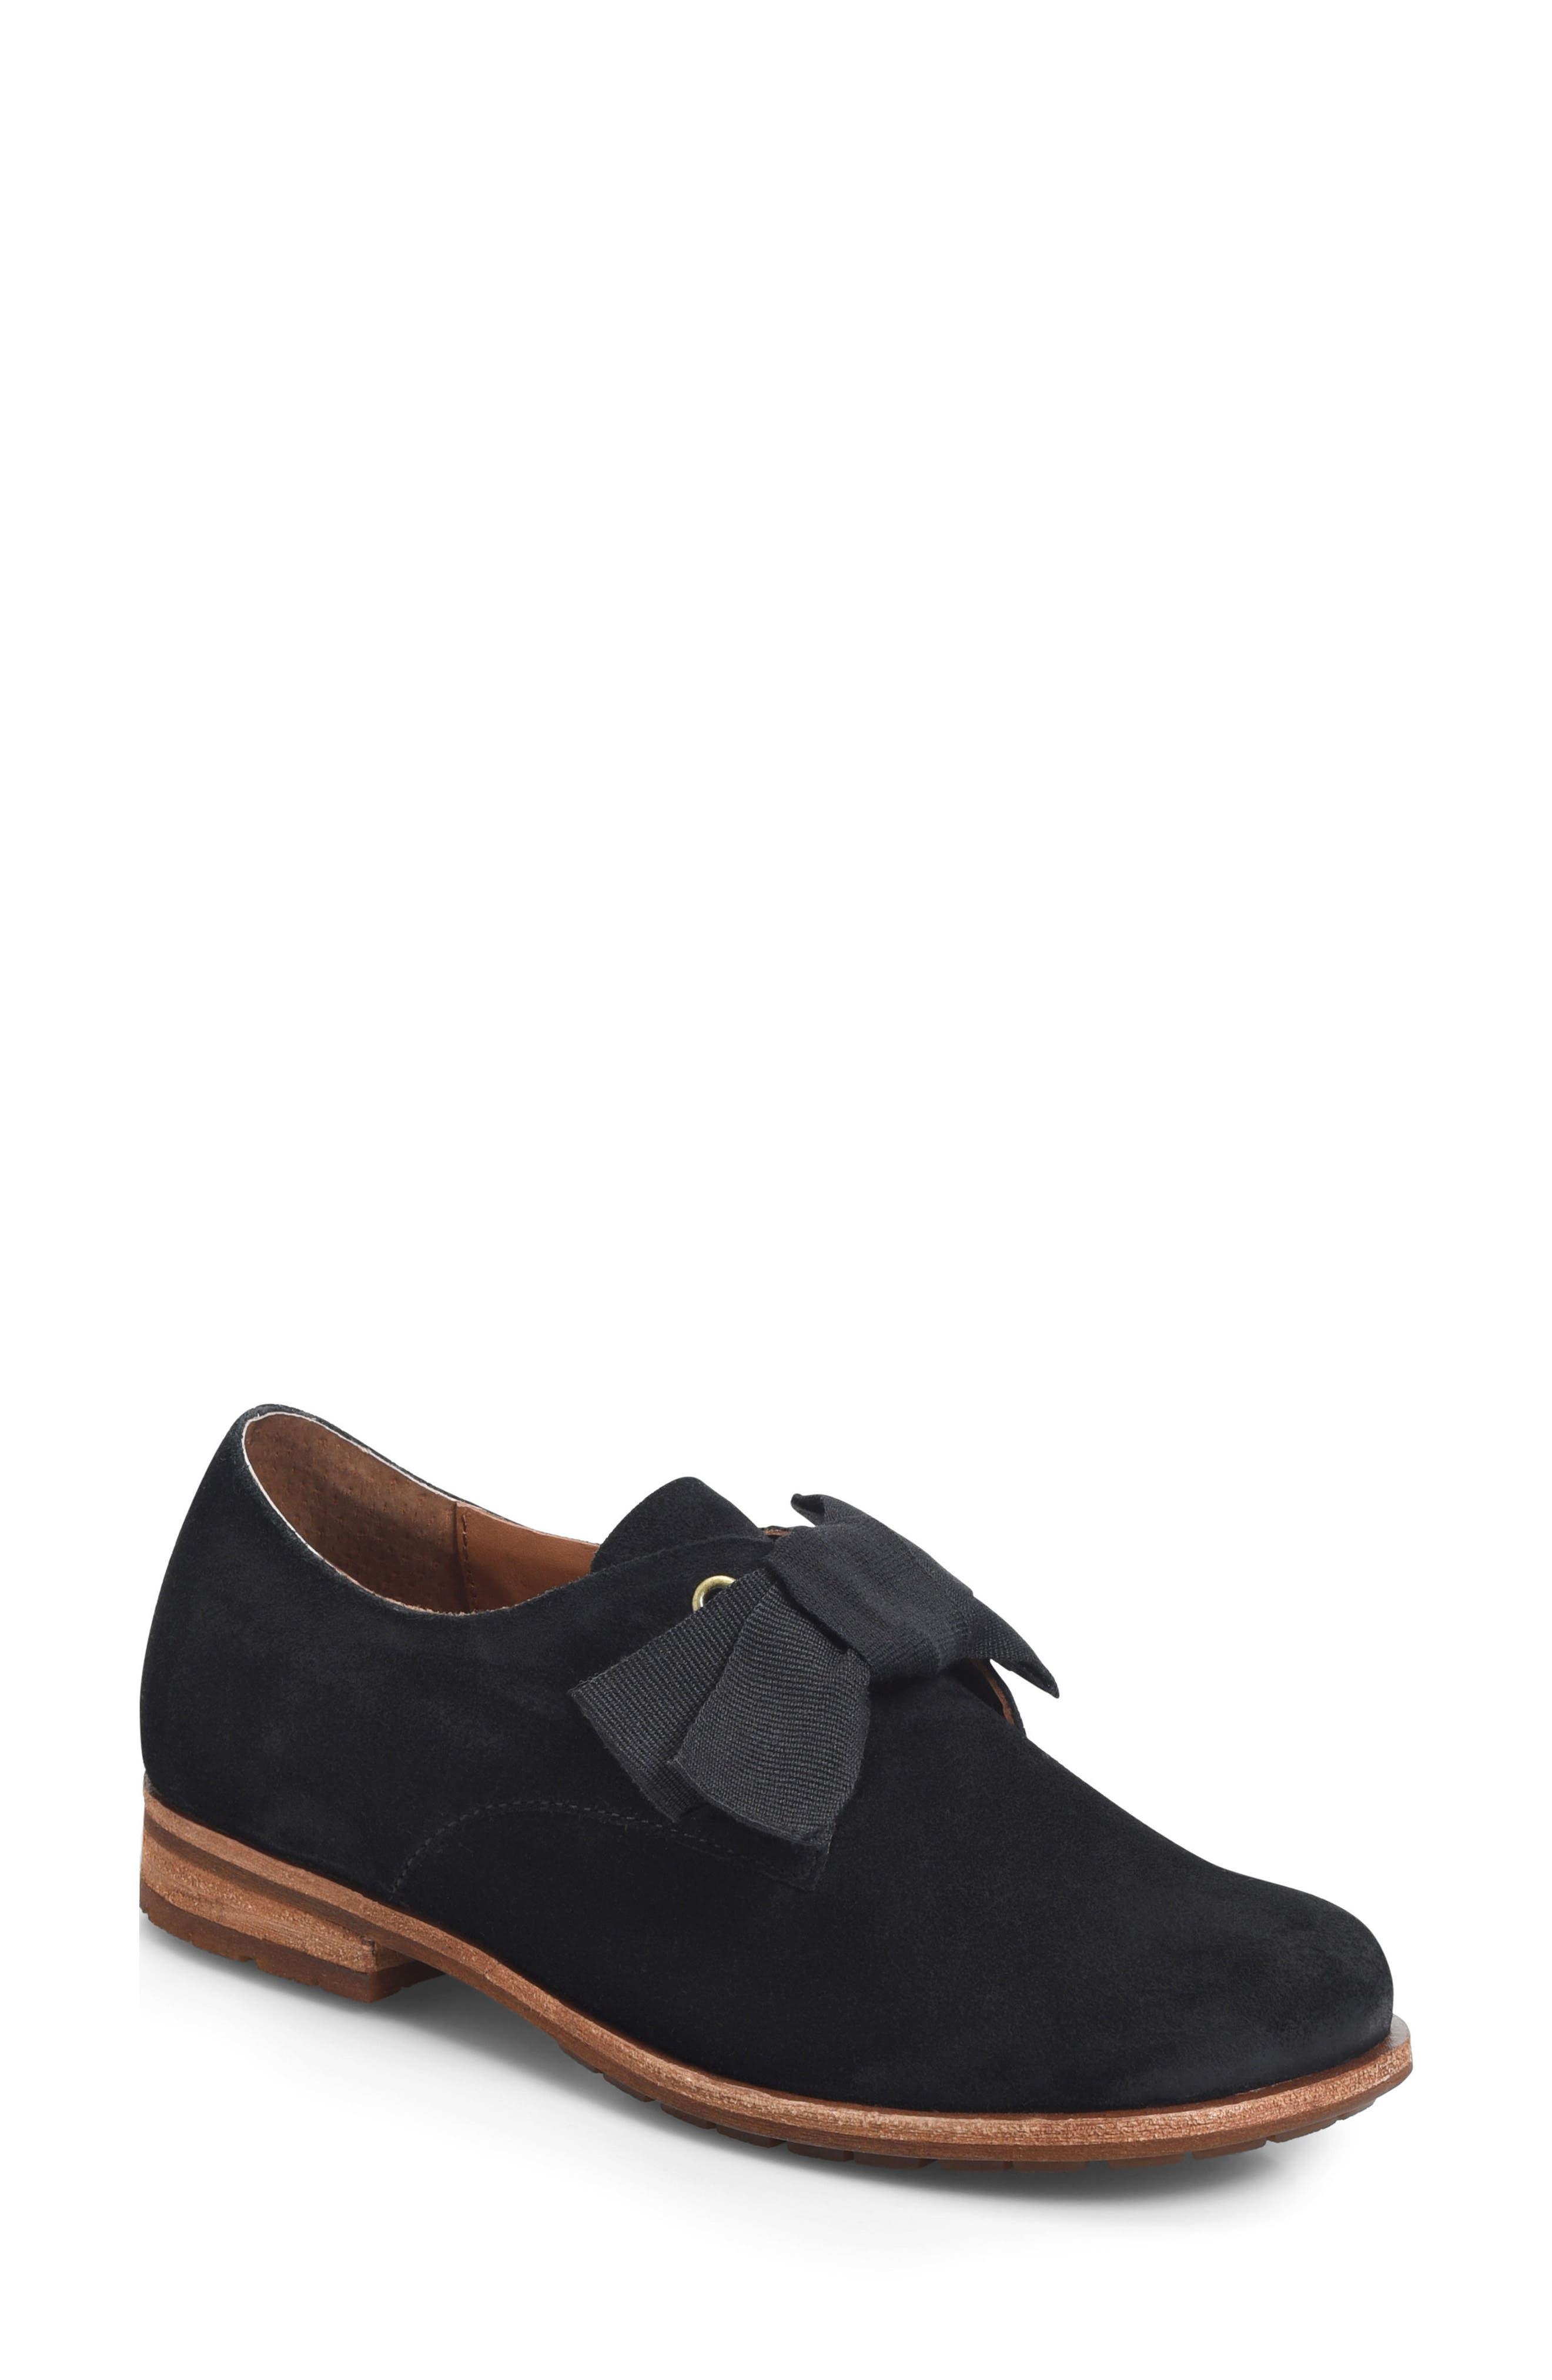 Beryl Bow Flat,                         Main,                         color, BLACK SUEDE